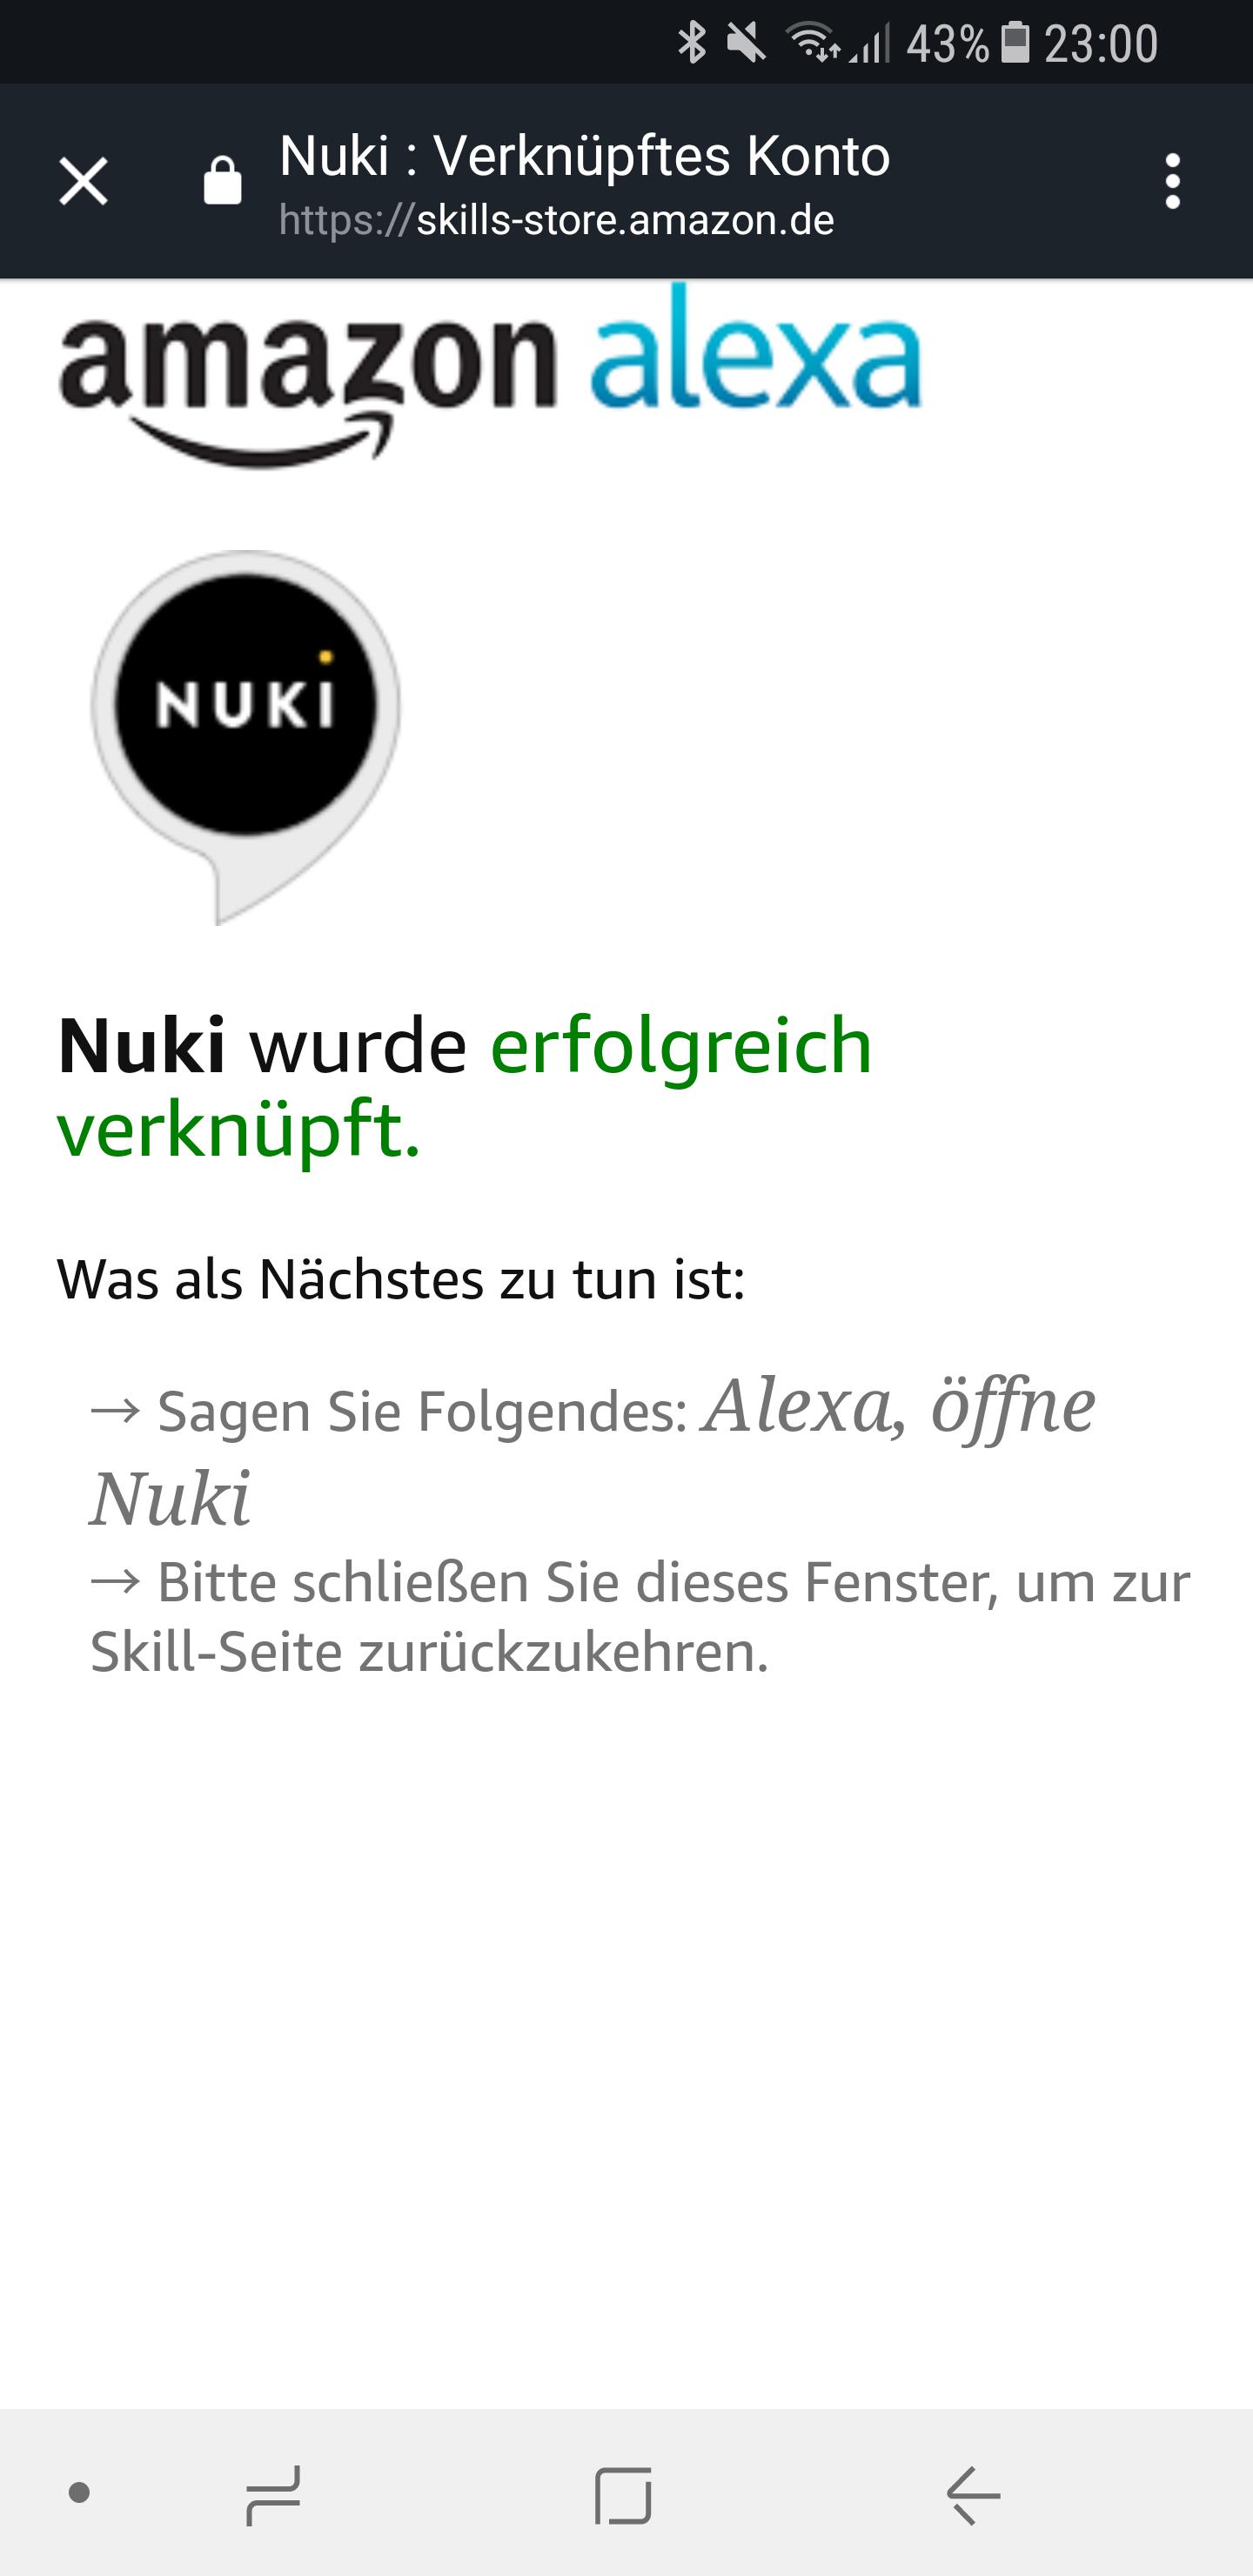 Nuki mit Alexa verbinden 14